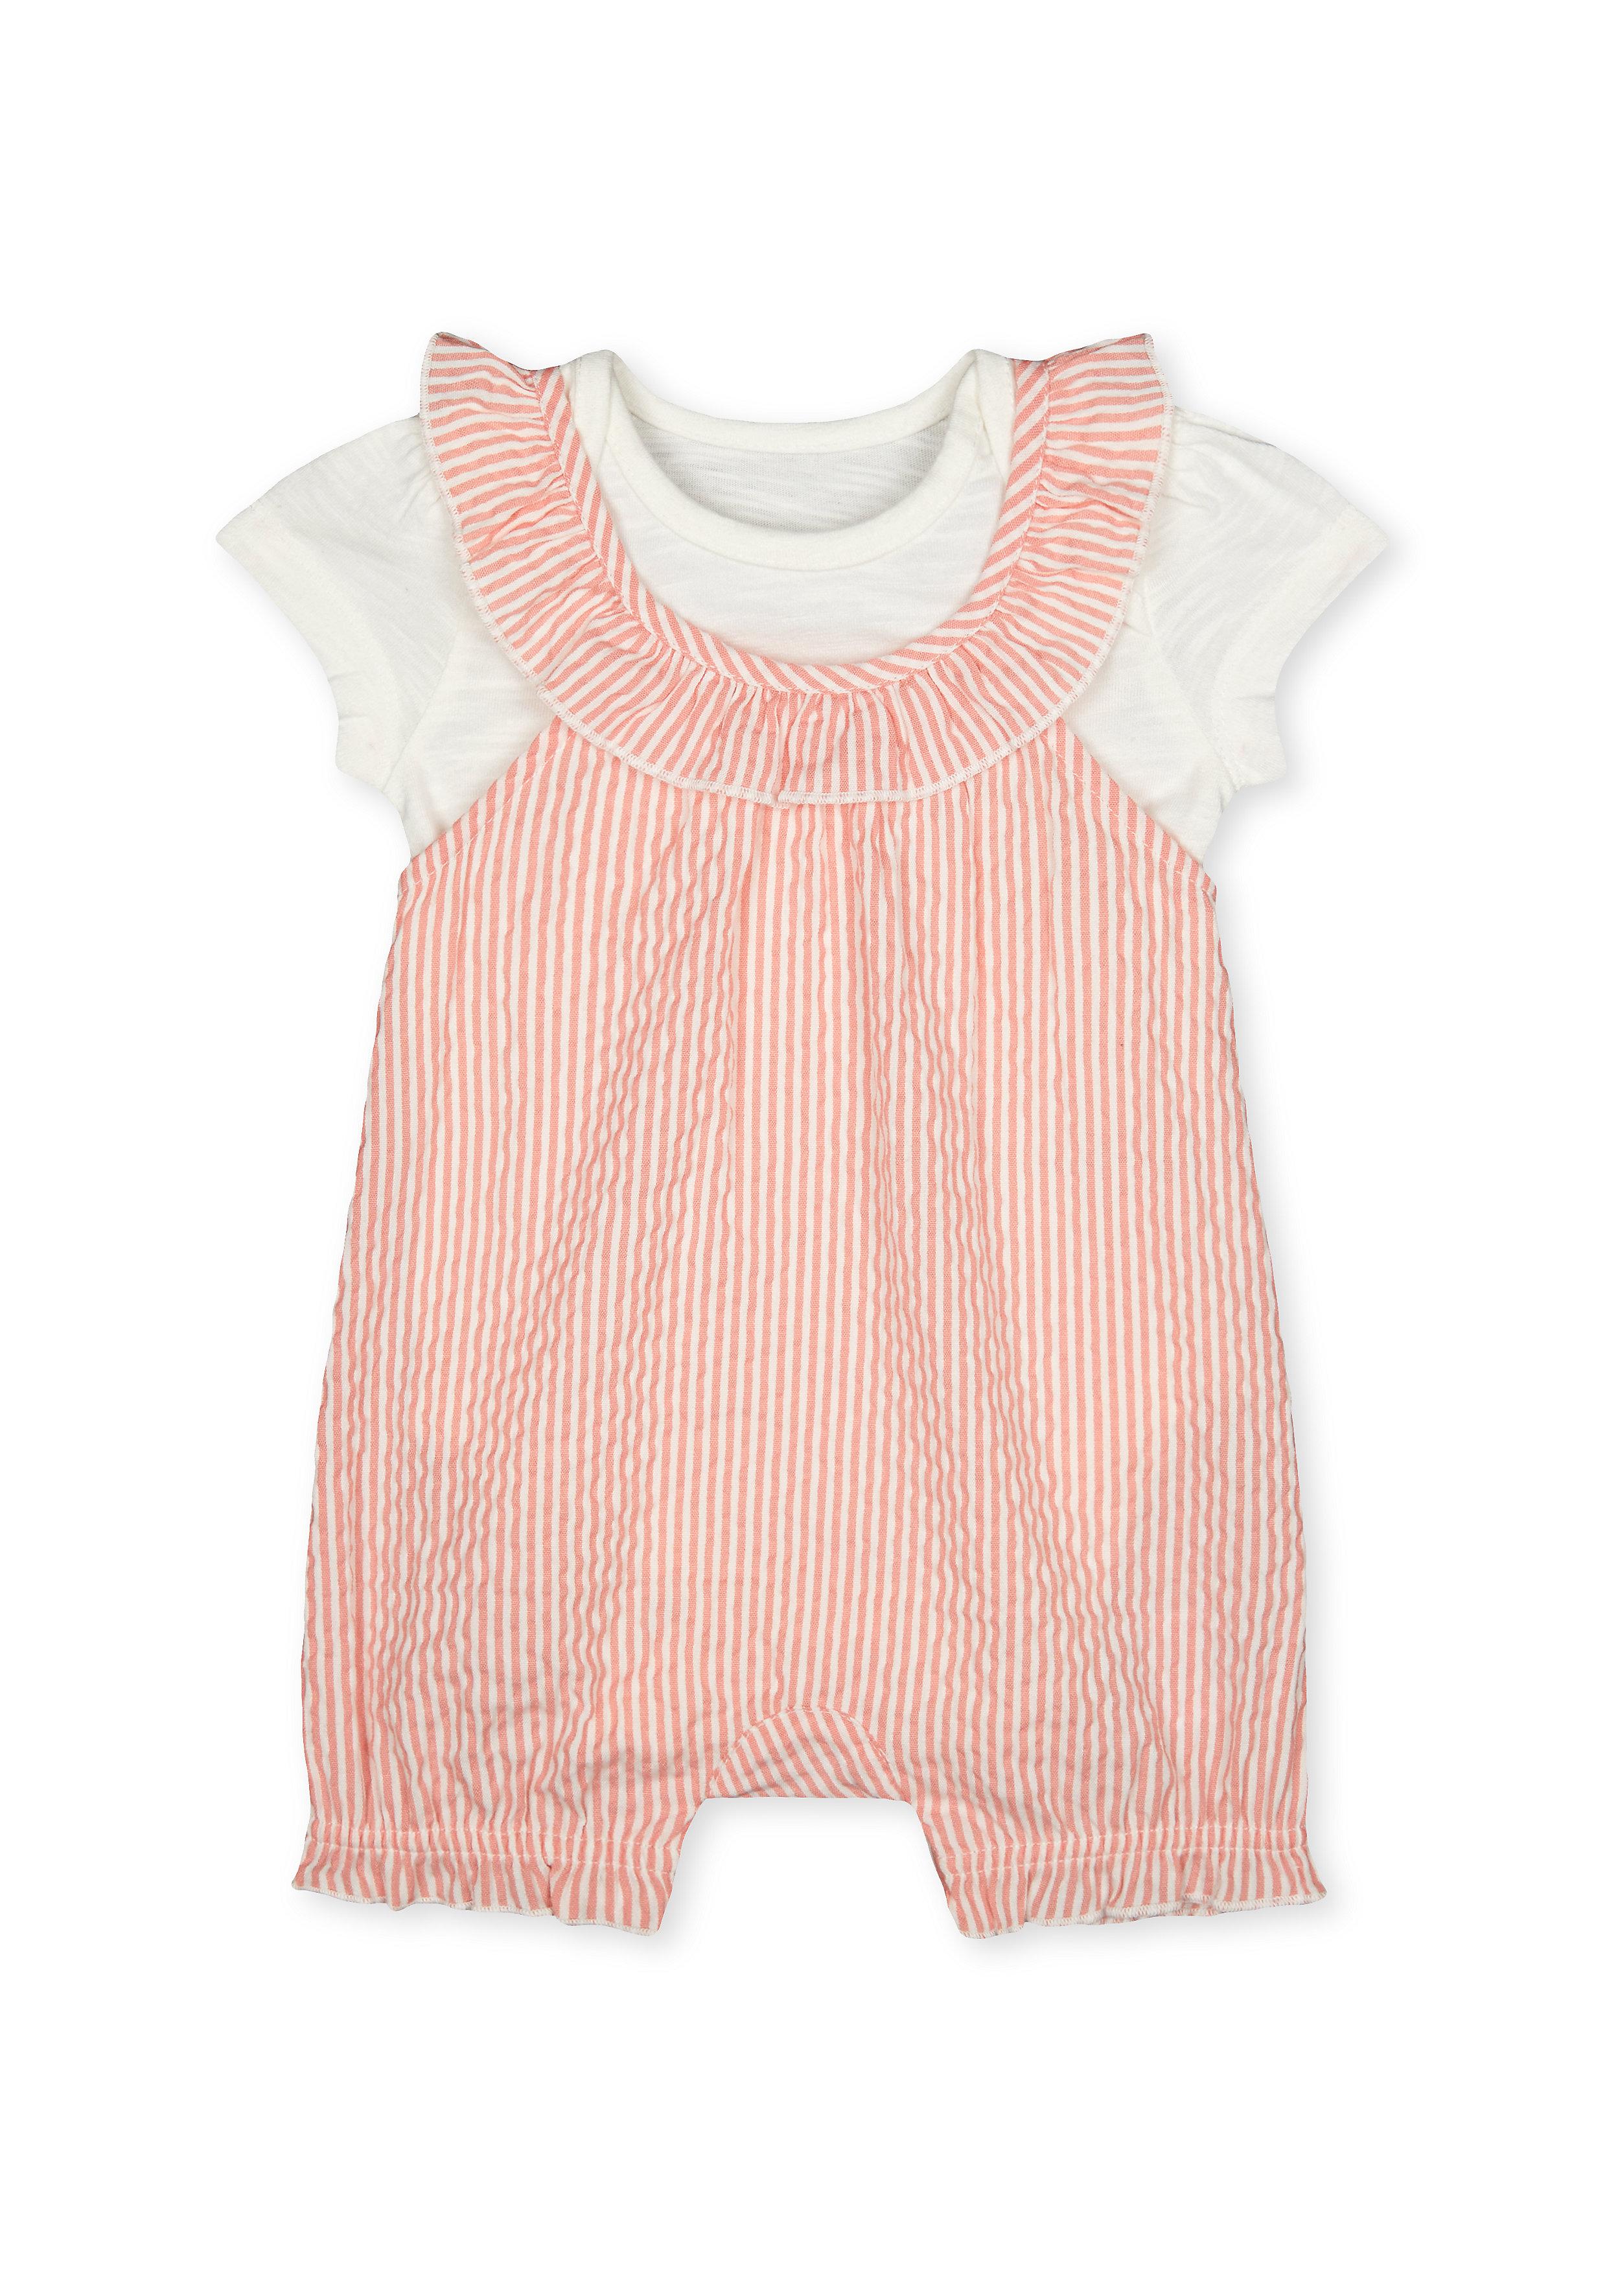 Mothercare   Girls Half Sleeves Striped Dungaree Set - Pink